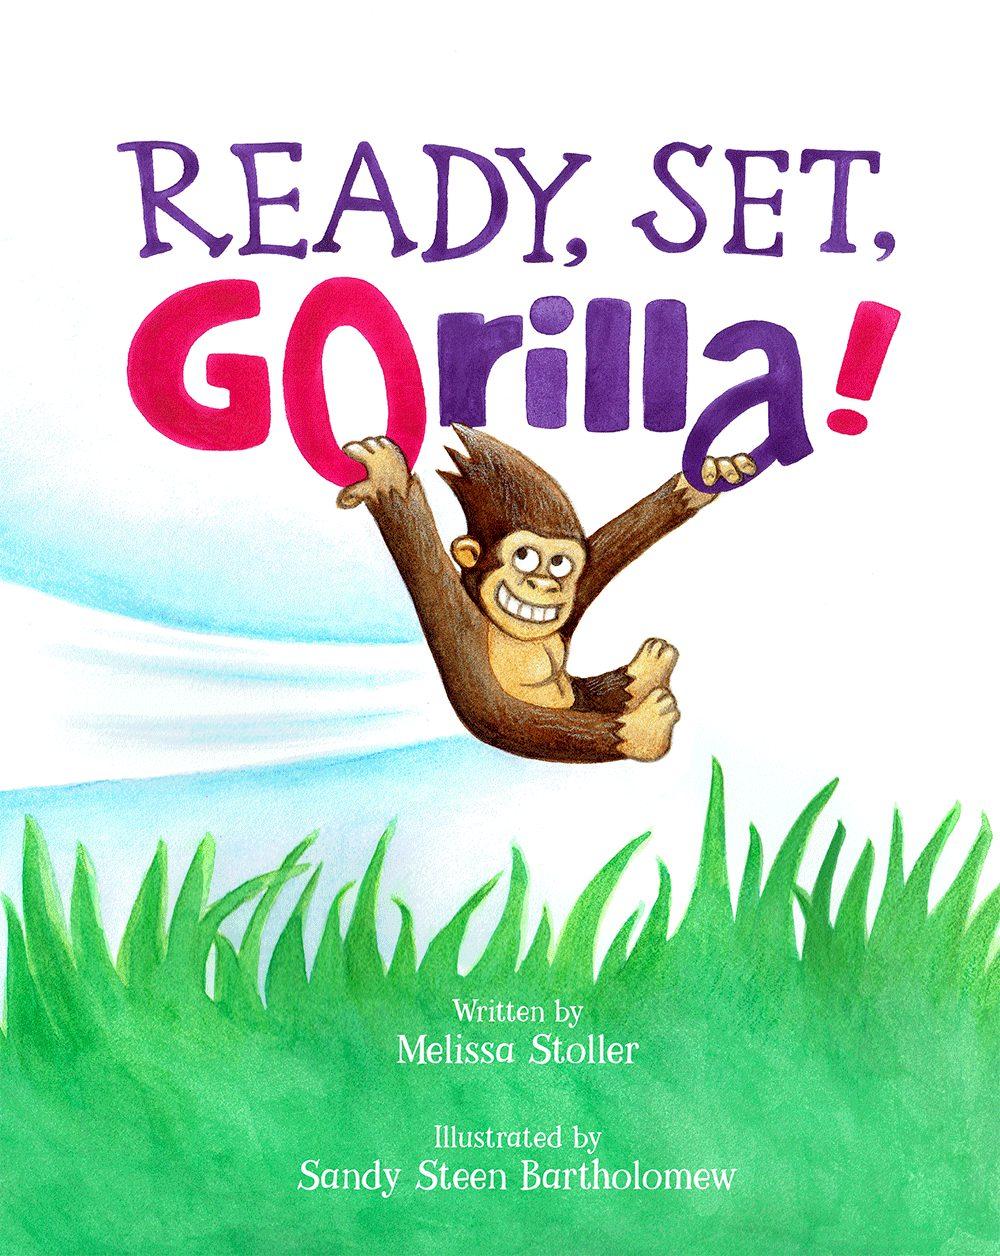 READY, SET, GORILLA